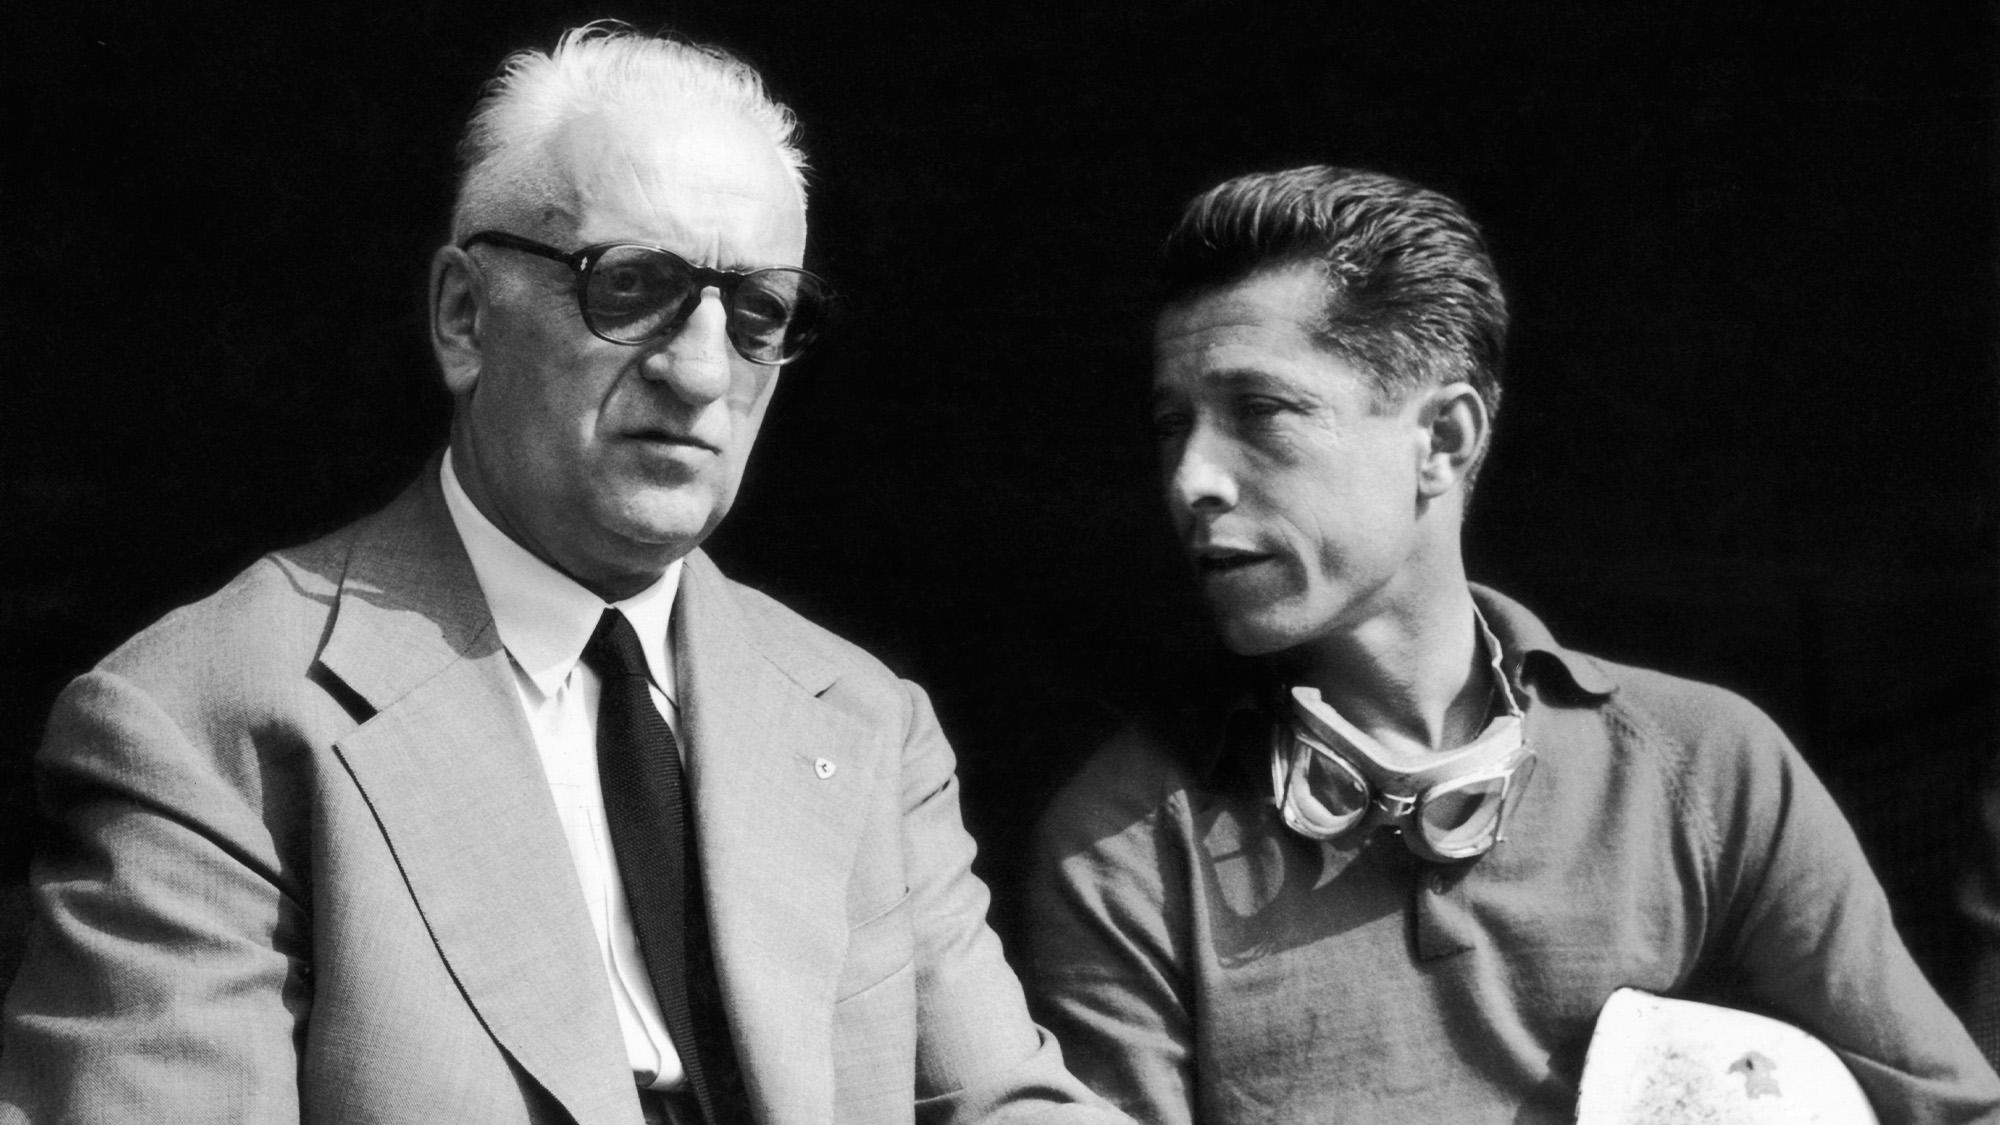 Enzo Ferrari with Olivier Gendebien at Monza in September 1959